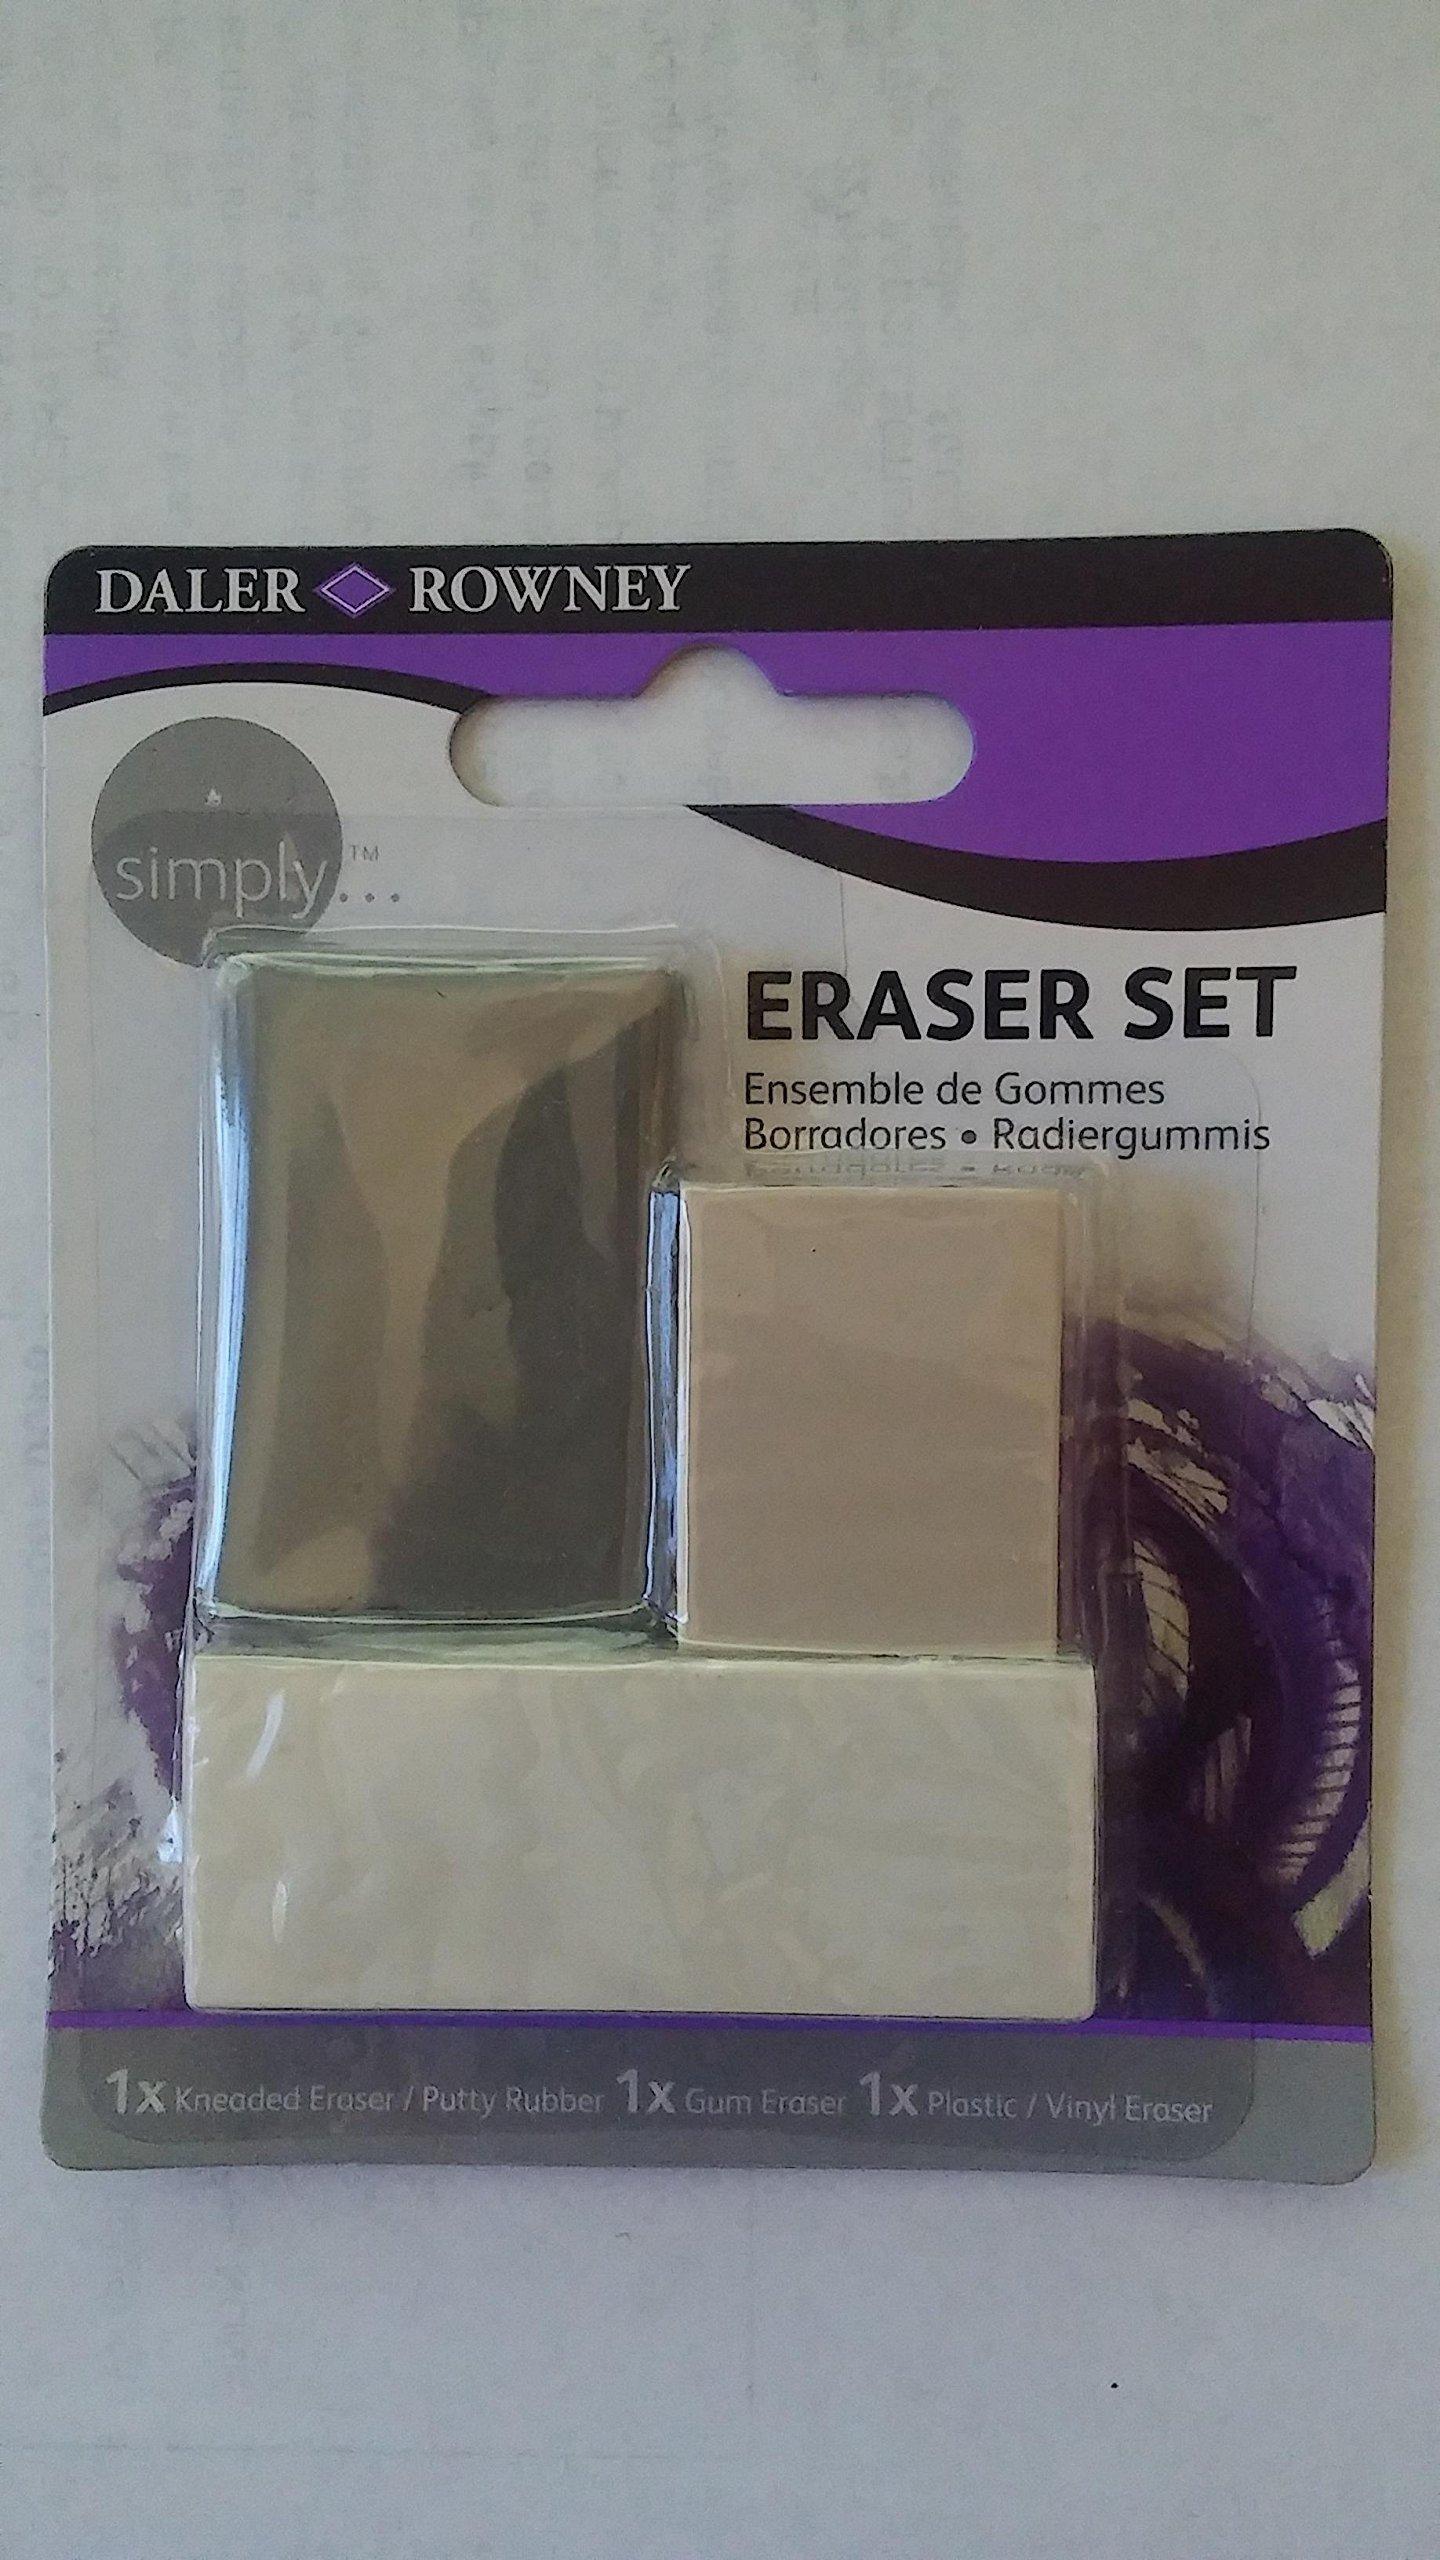 Daler Rowney Simply Eraser Set 3pk